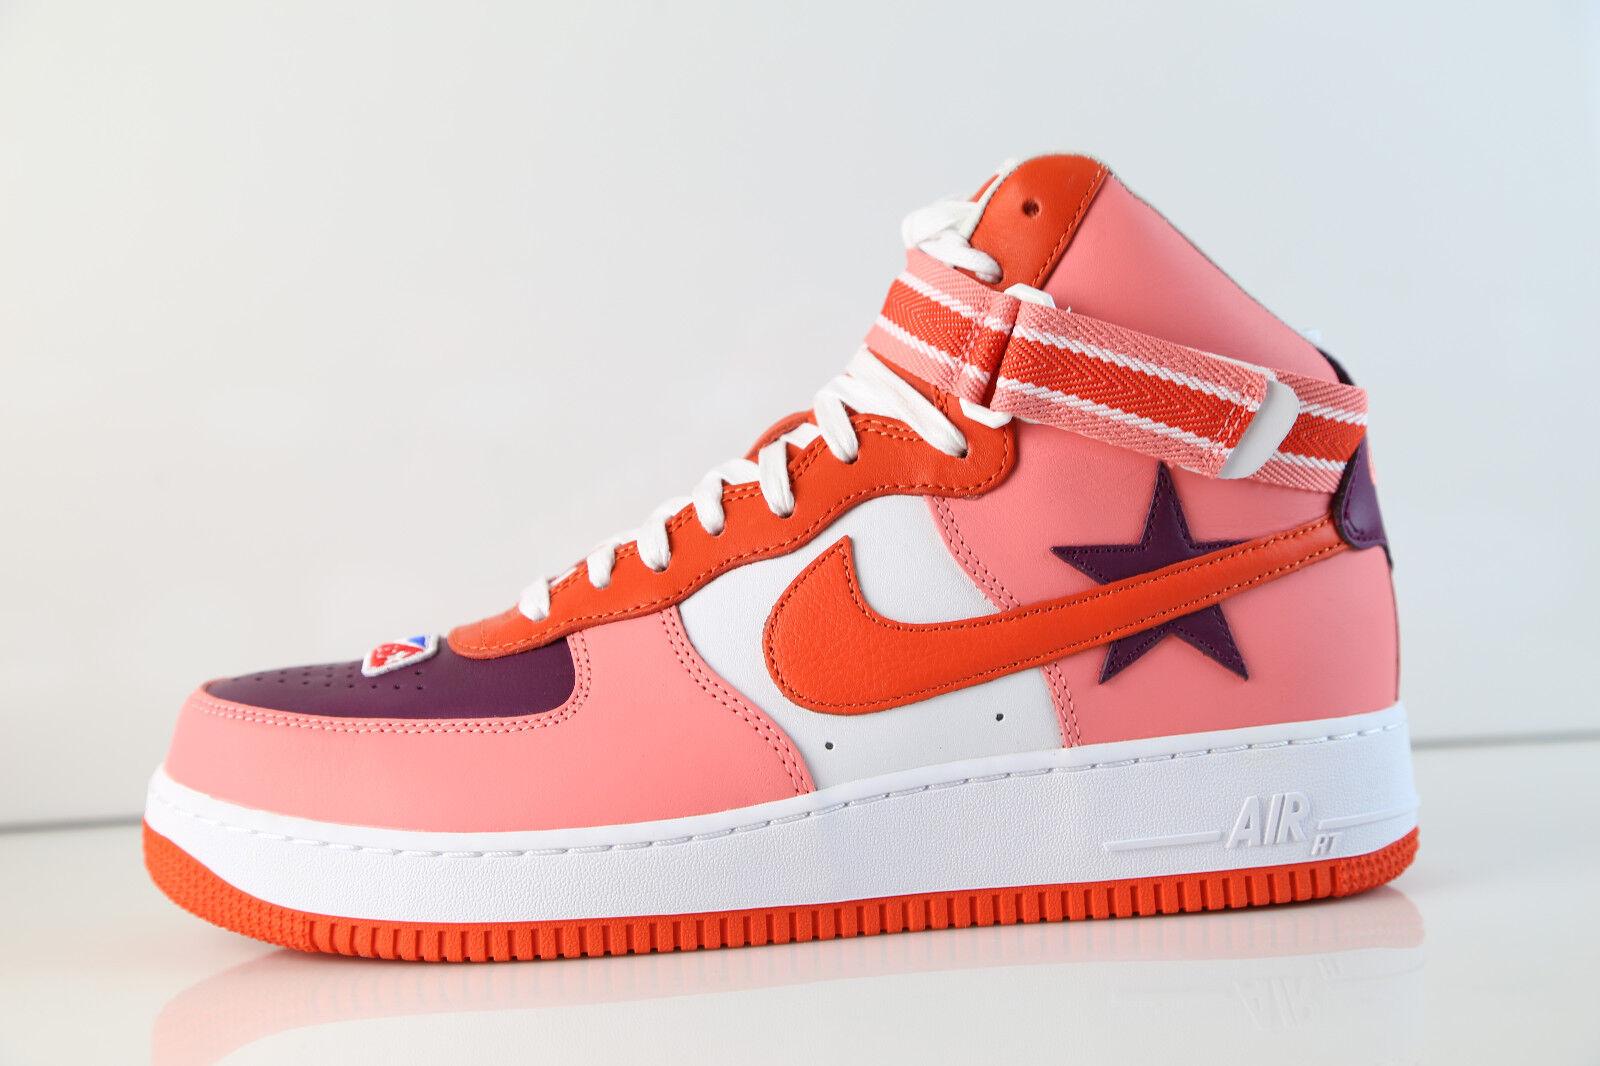 Nike air force 1 hi rt ricardo tisci sunblust bordeaux squadra arancione aq3366-601